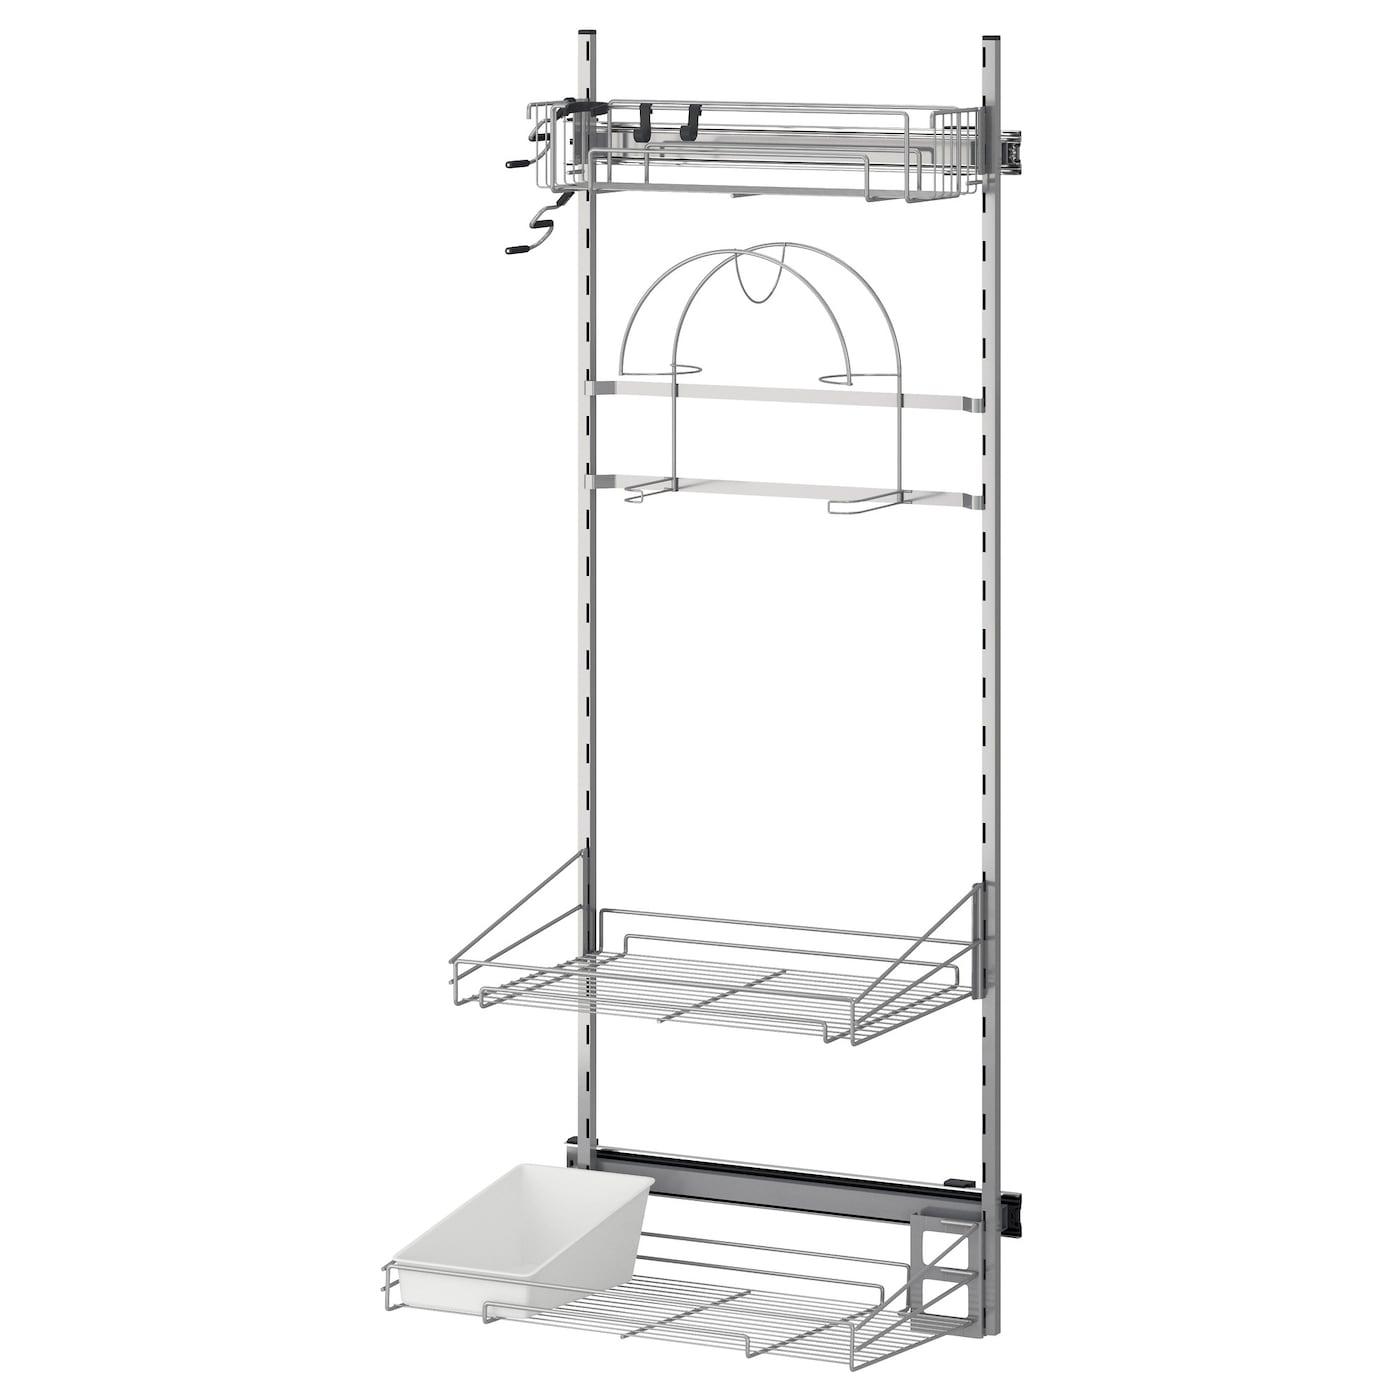 utrusta rangement produits entretien 140 cm ikea. Black Bedroom Furniture Sets. Home Design Ideas